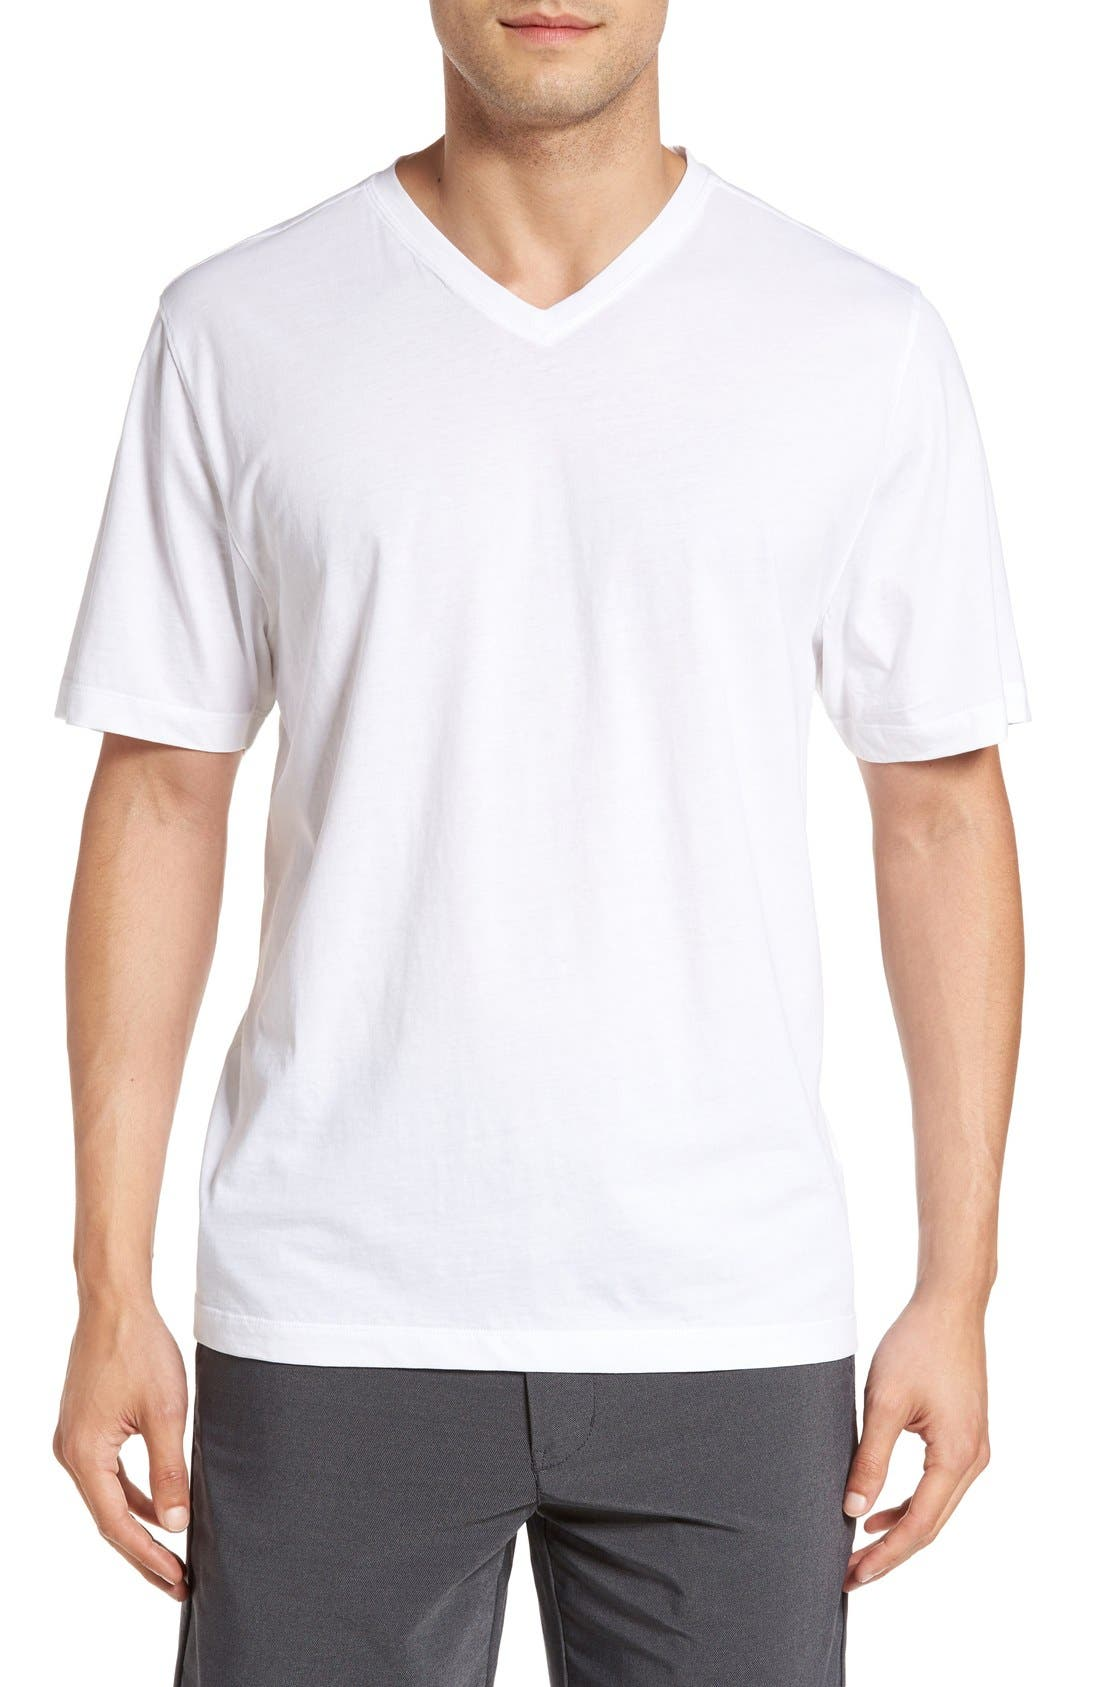 Alternate Image 1 Selected - Cutter & Buck 'Sida' V-Neck T-Shirt (Big & Tall)